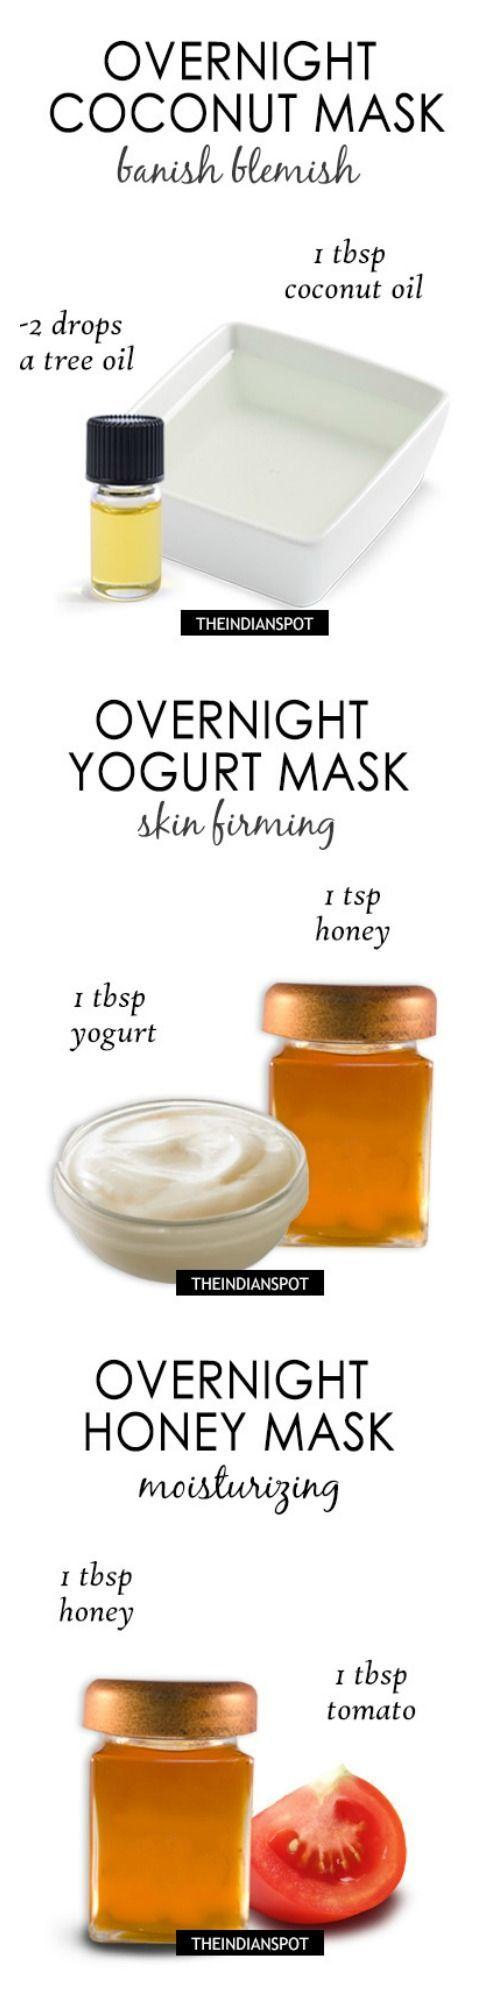 Overnight Diy Face Mask Diy Overnight Face Mask Overnight Face Mask Glowing Skin Mask